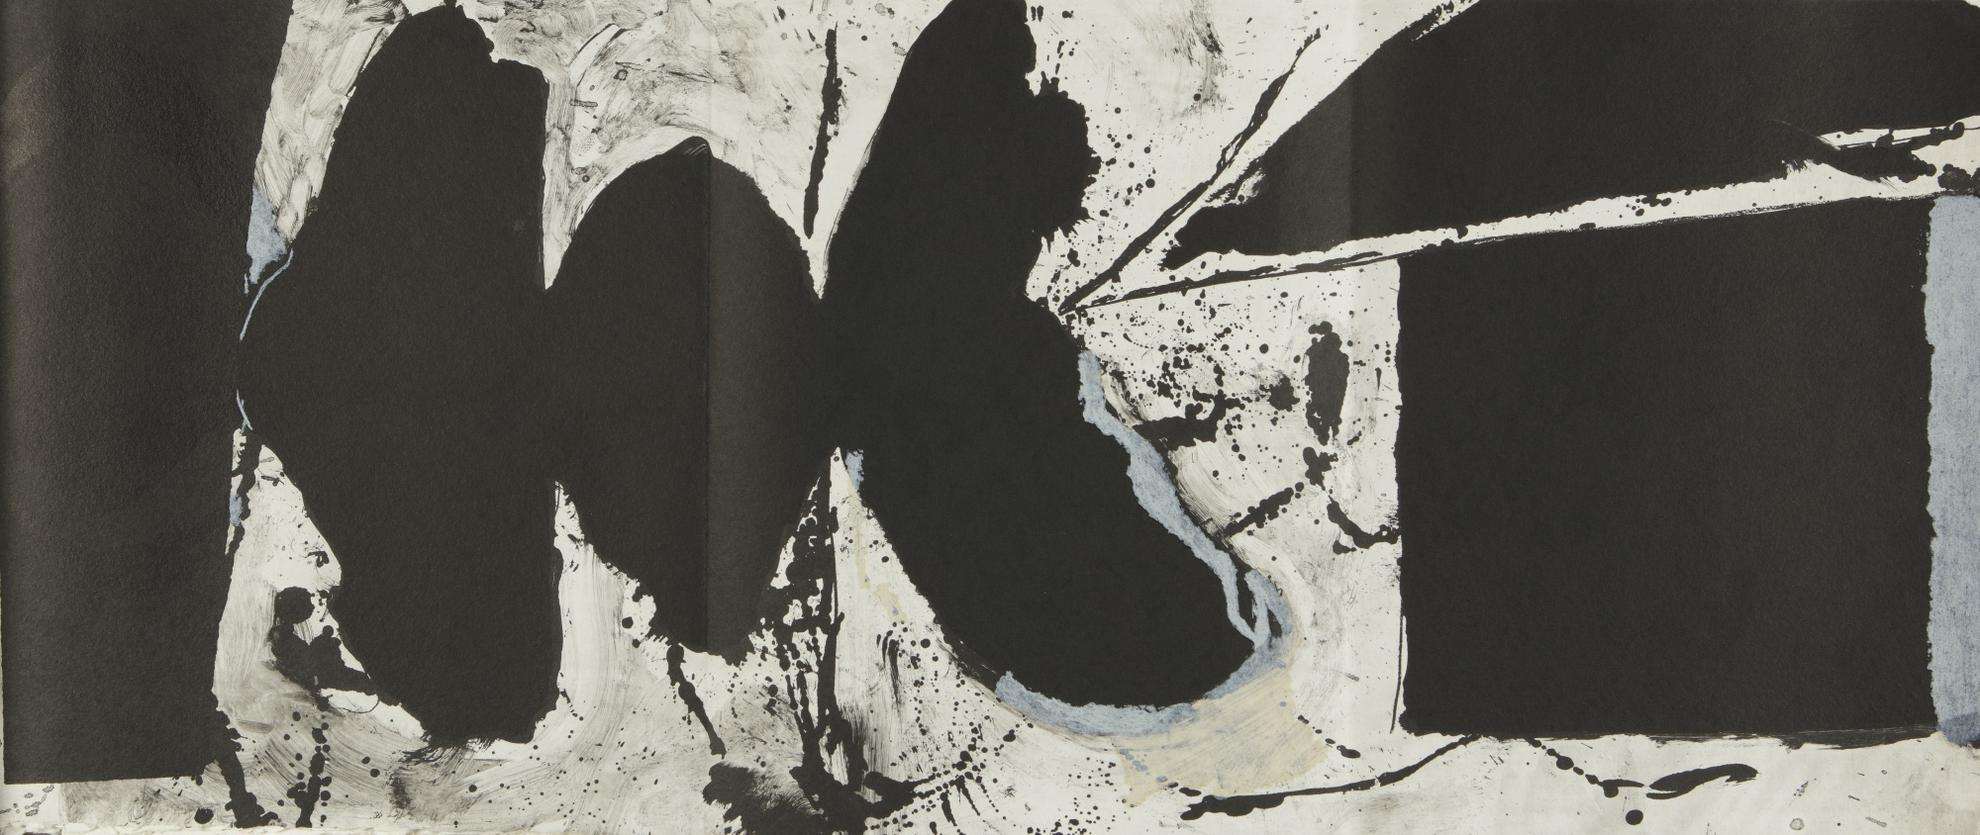 Robert Motherwell-El Negro (W.A.C. 308.1-.21)-1983